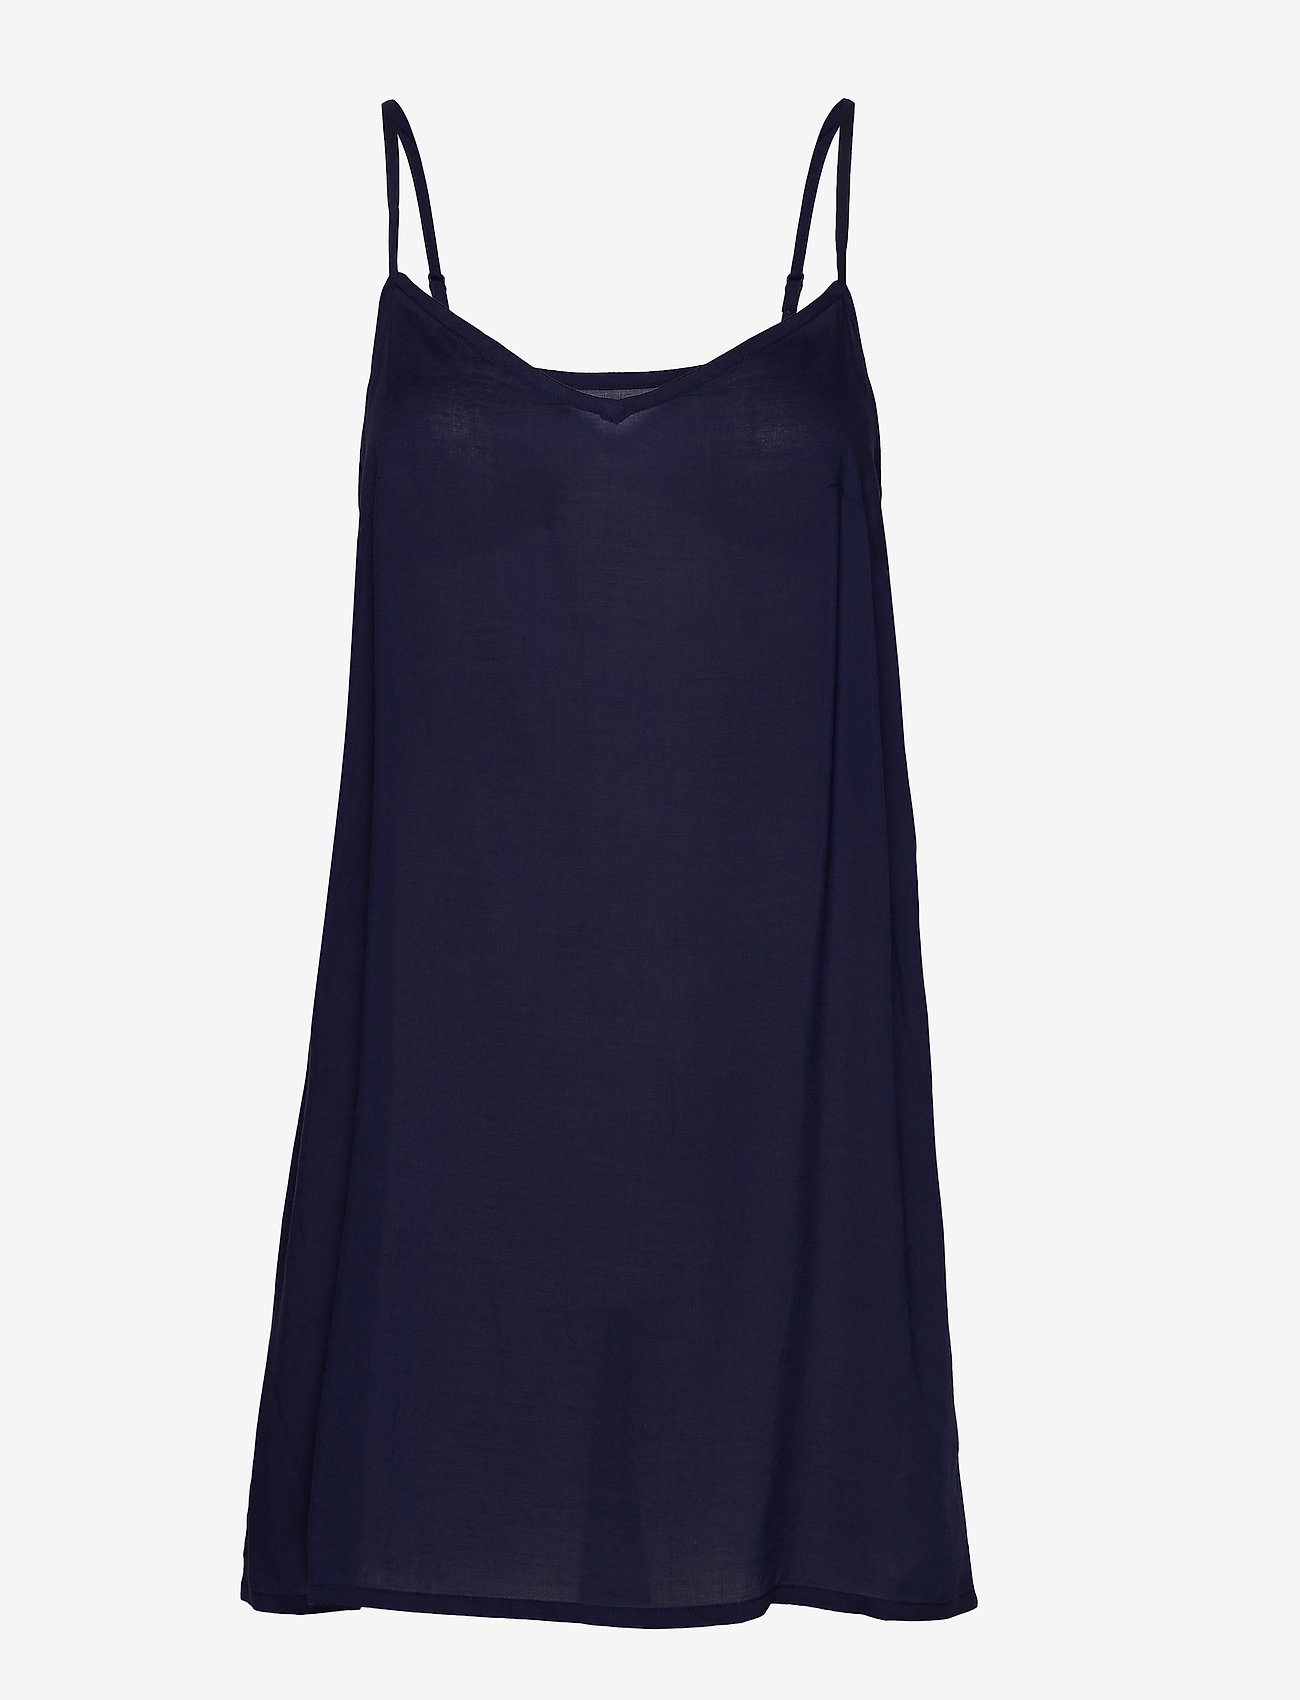 Esprit Casual Dresses light woven - Sukienki EMERALD GREEN - Kobiety Odzież.